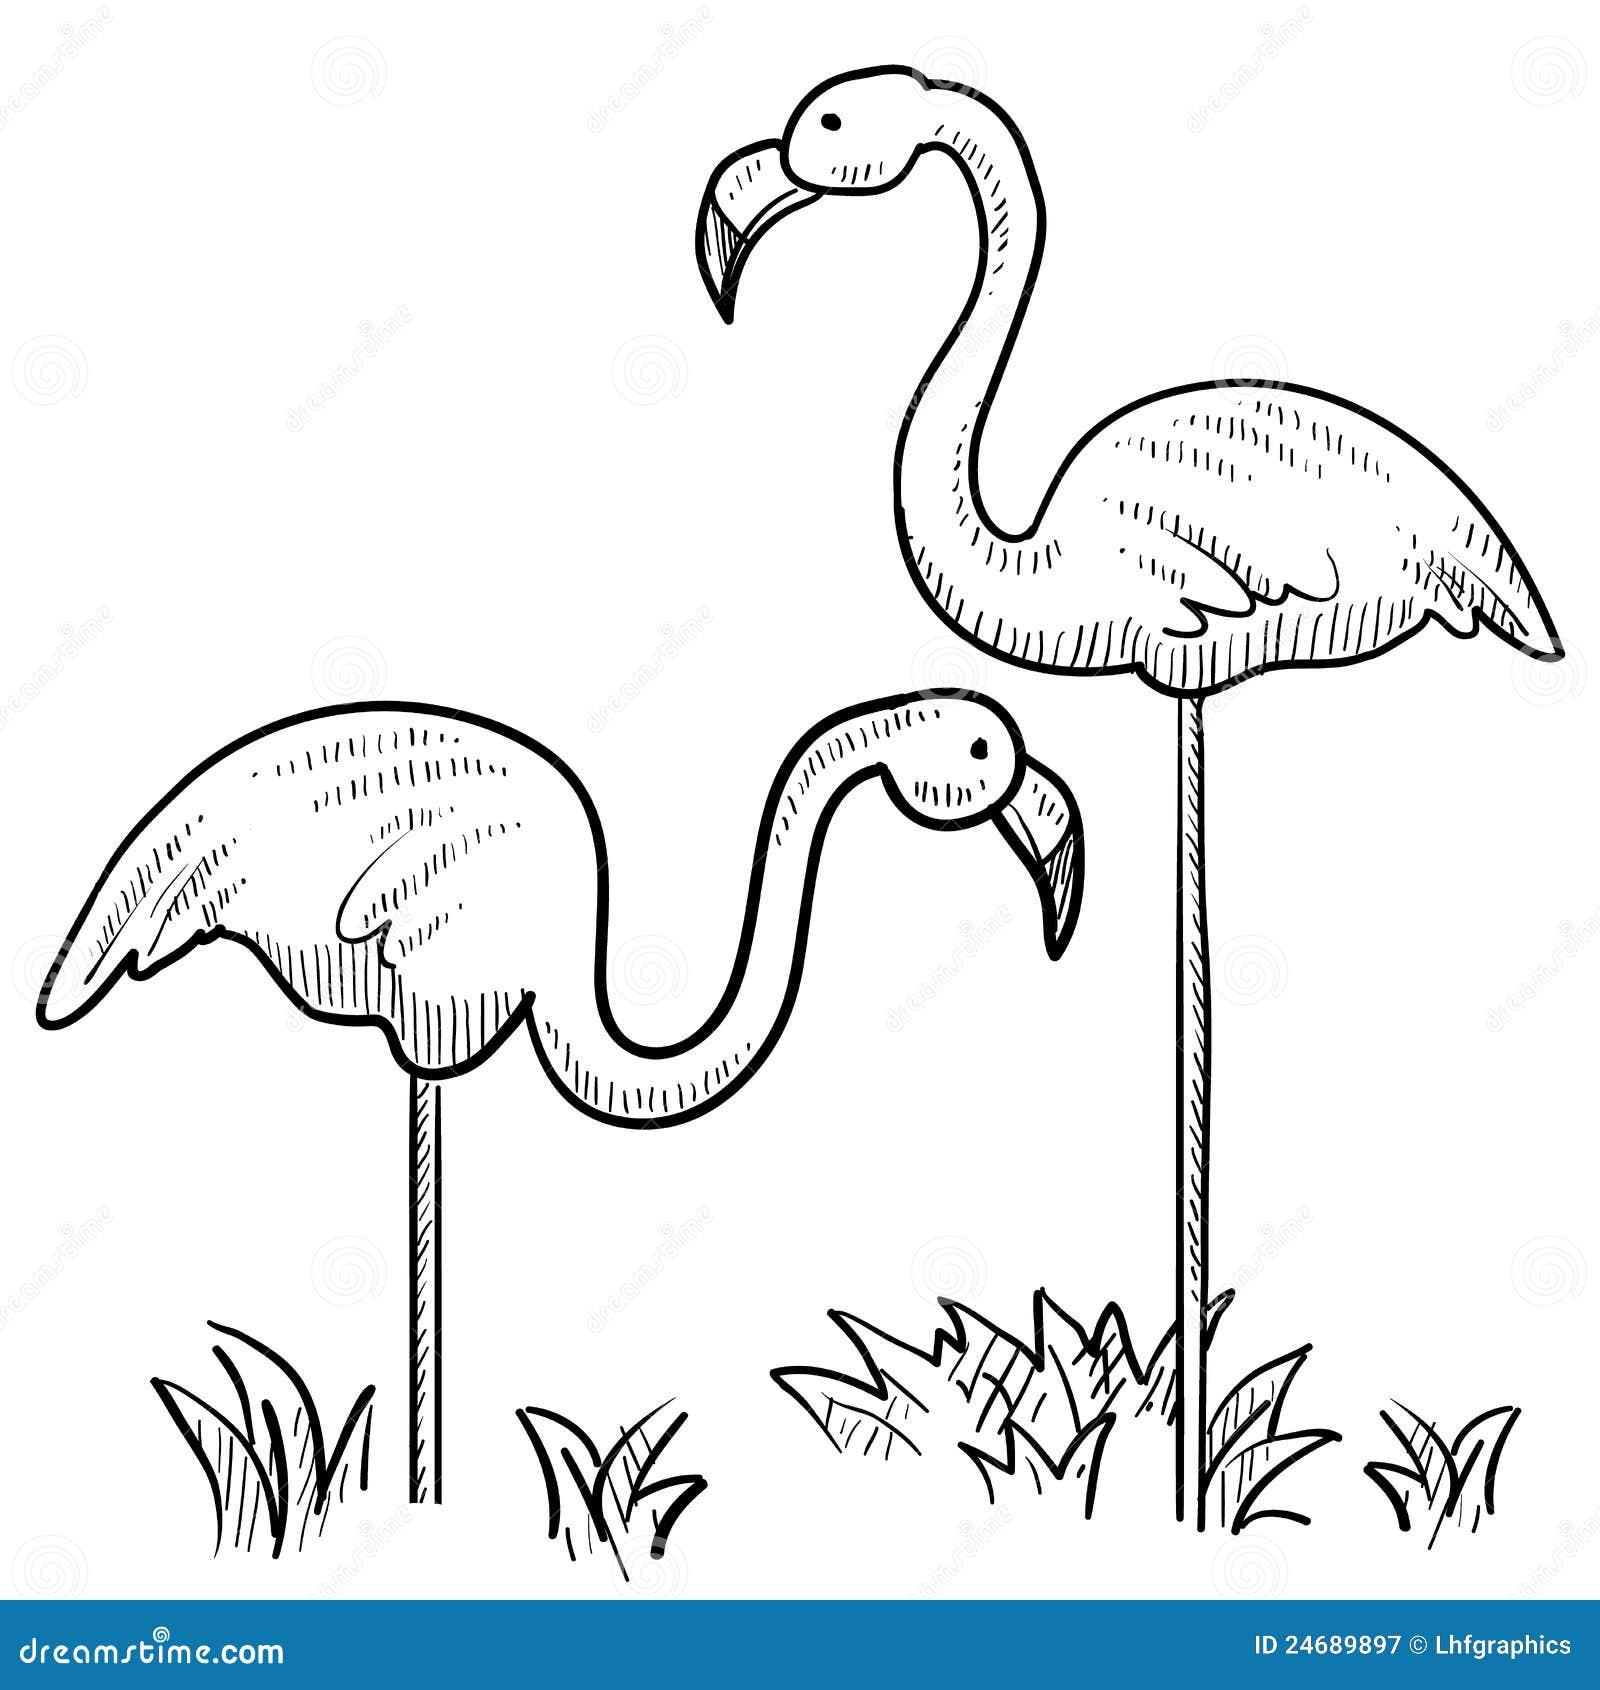 Flamingo Vector Royalty Free Stock Photography Image